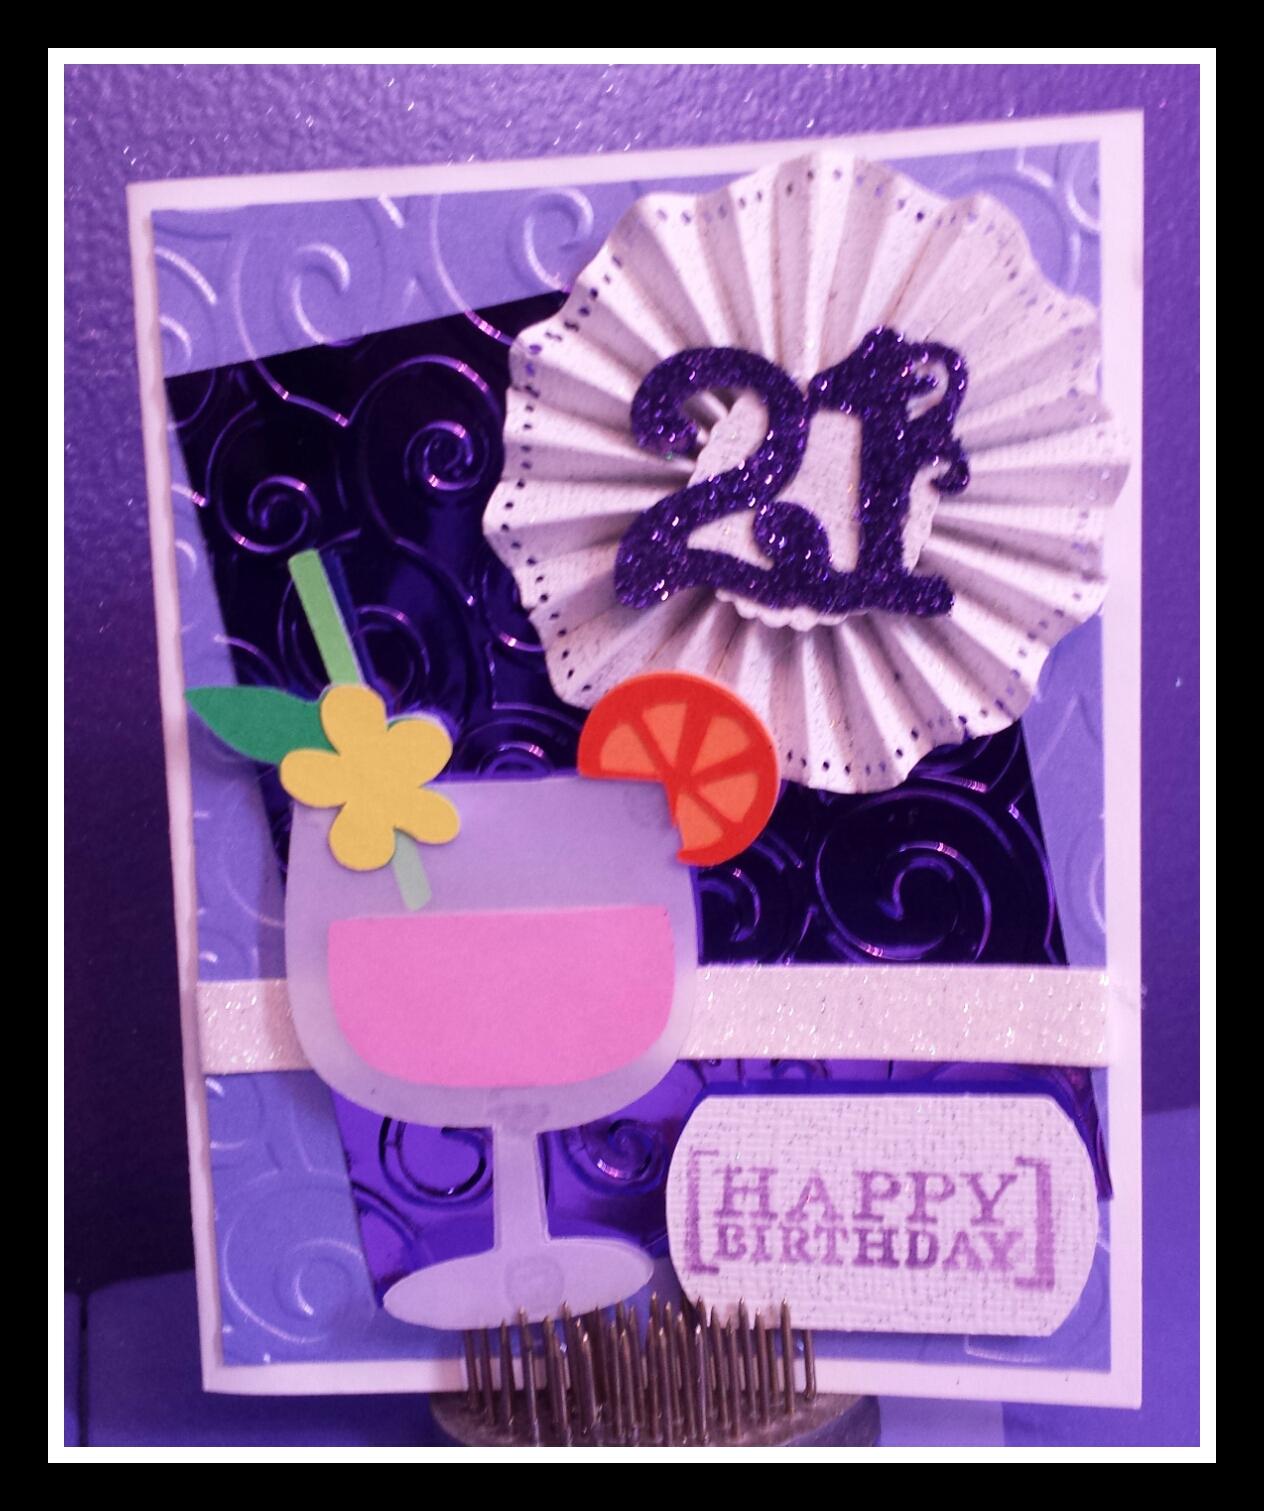 Melody Lane Designs: 21st Birthday Card